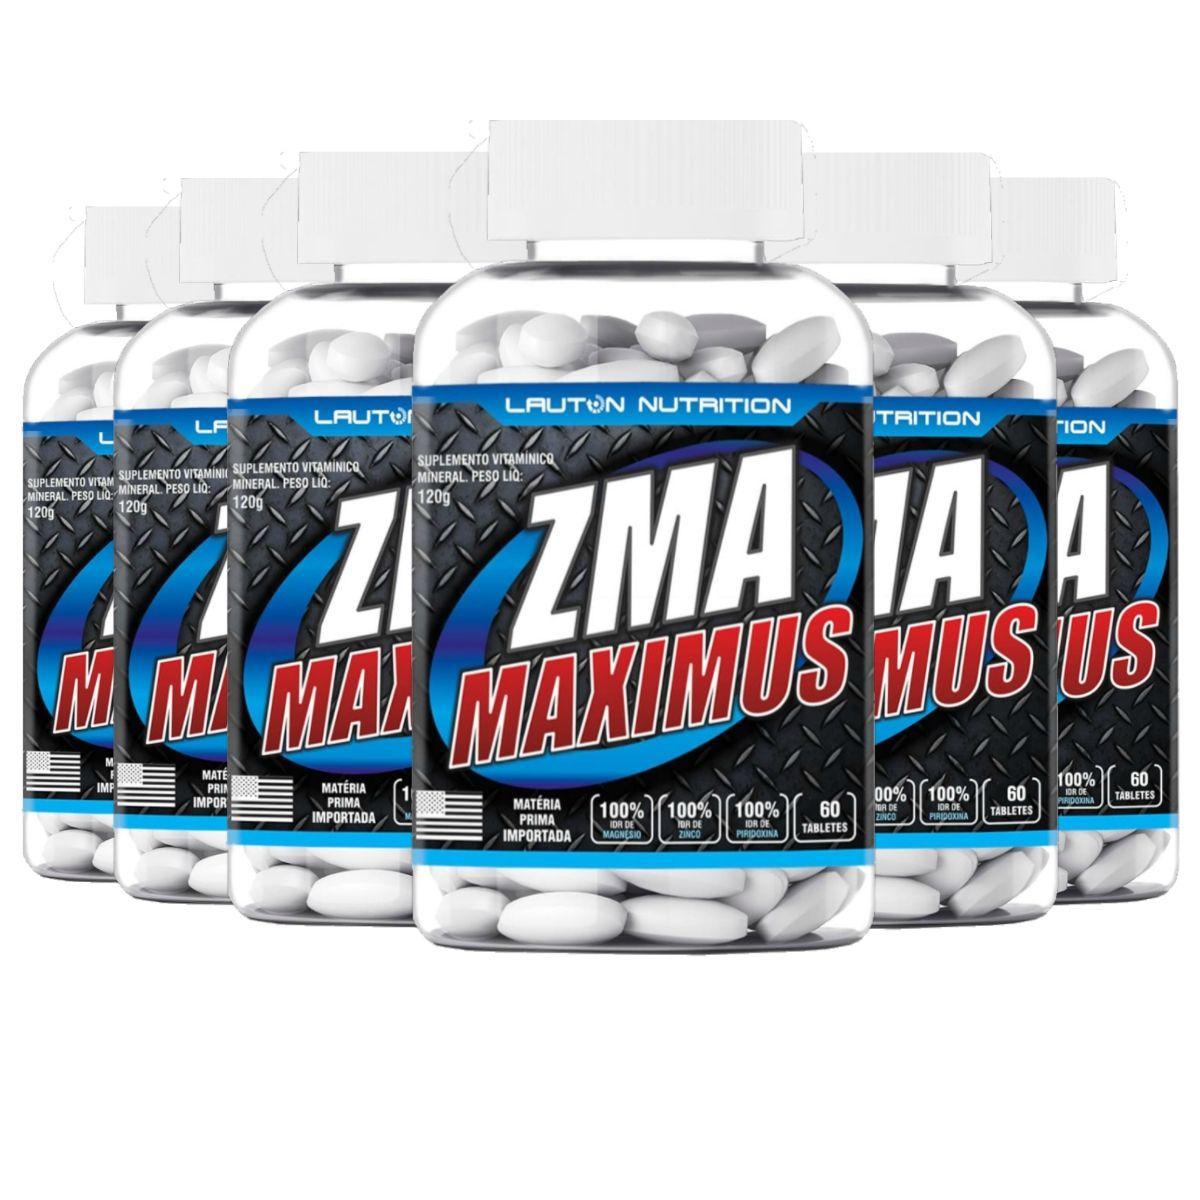 Kit 6 ZMA Maximus Lauton Nutrition - 60 Tablets 1G